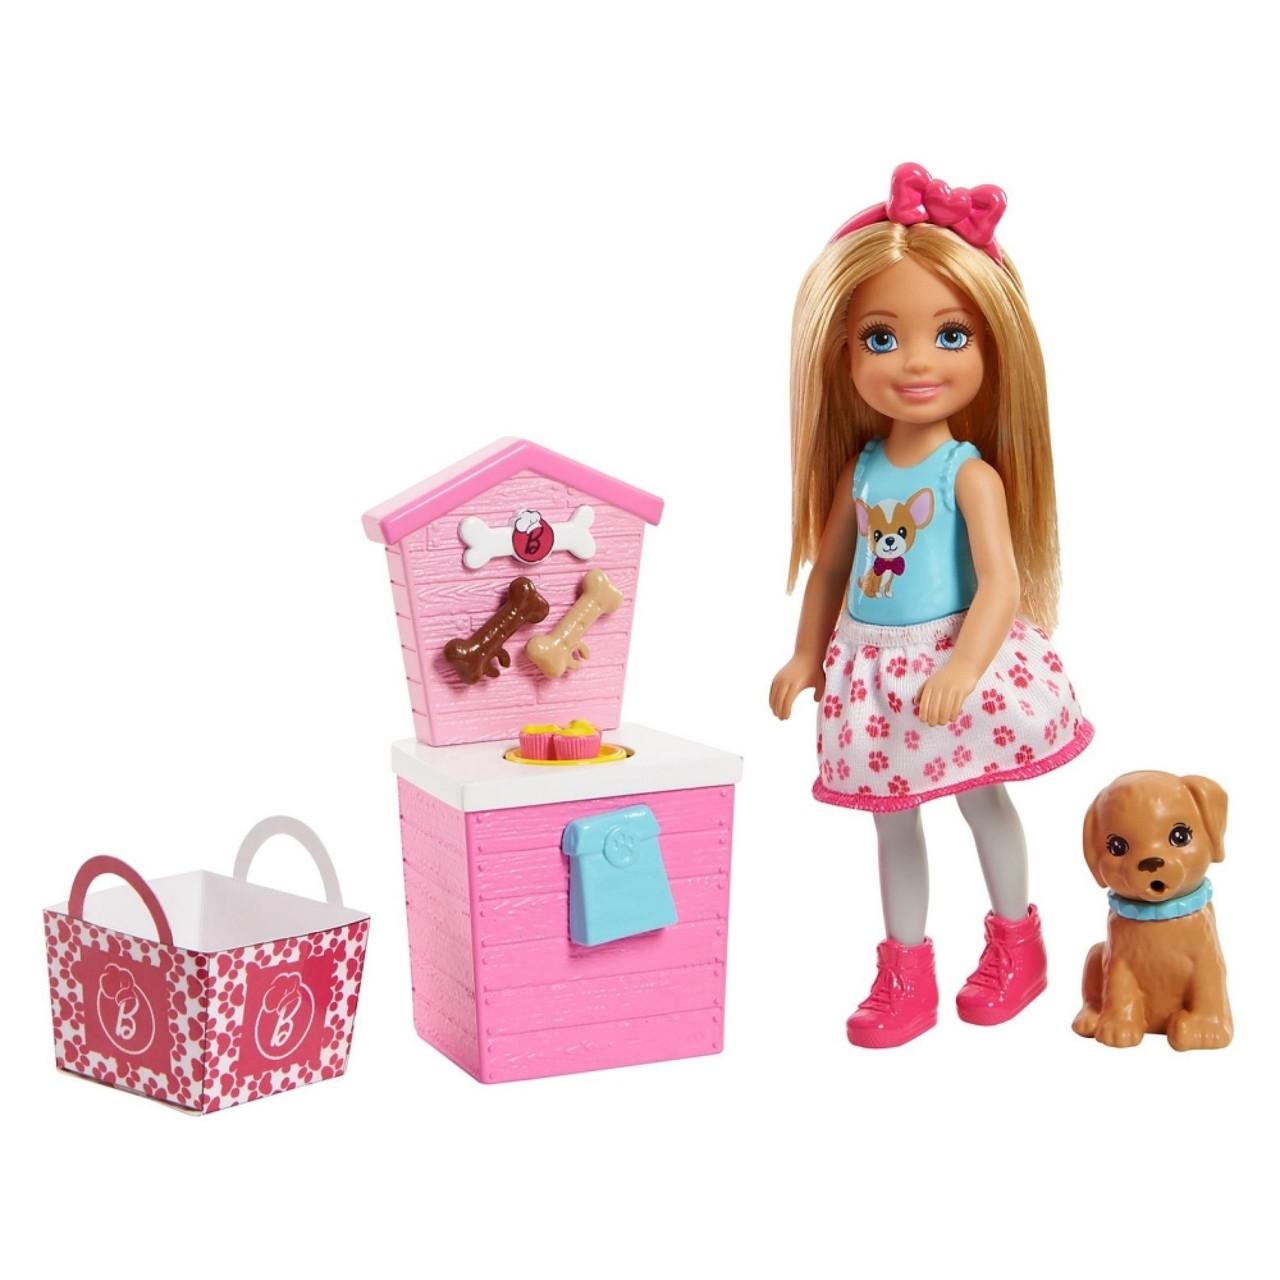 Barbie Барбі клуб Челсі і щеня стенд частувань FHP67 Club Chelsea Doll and Playset Puppy Shop